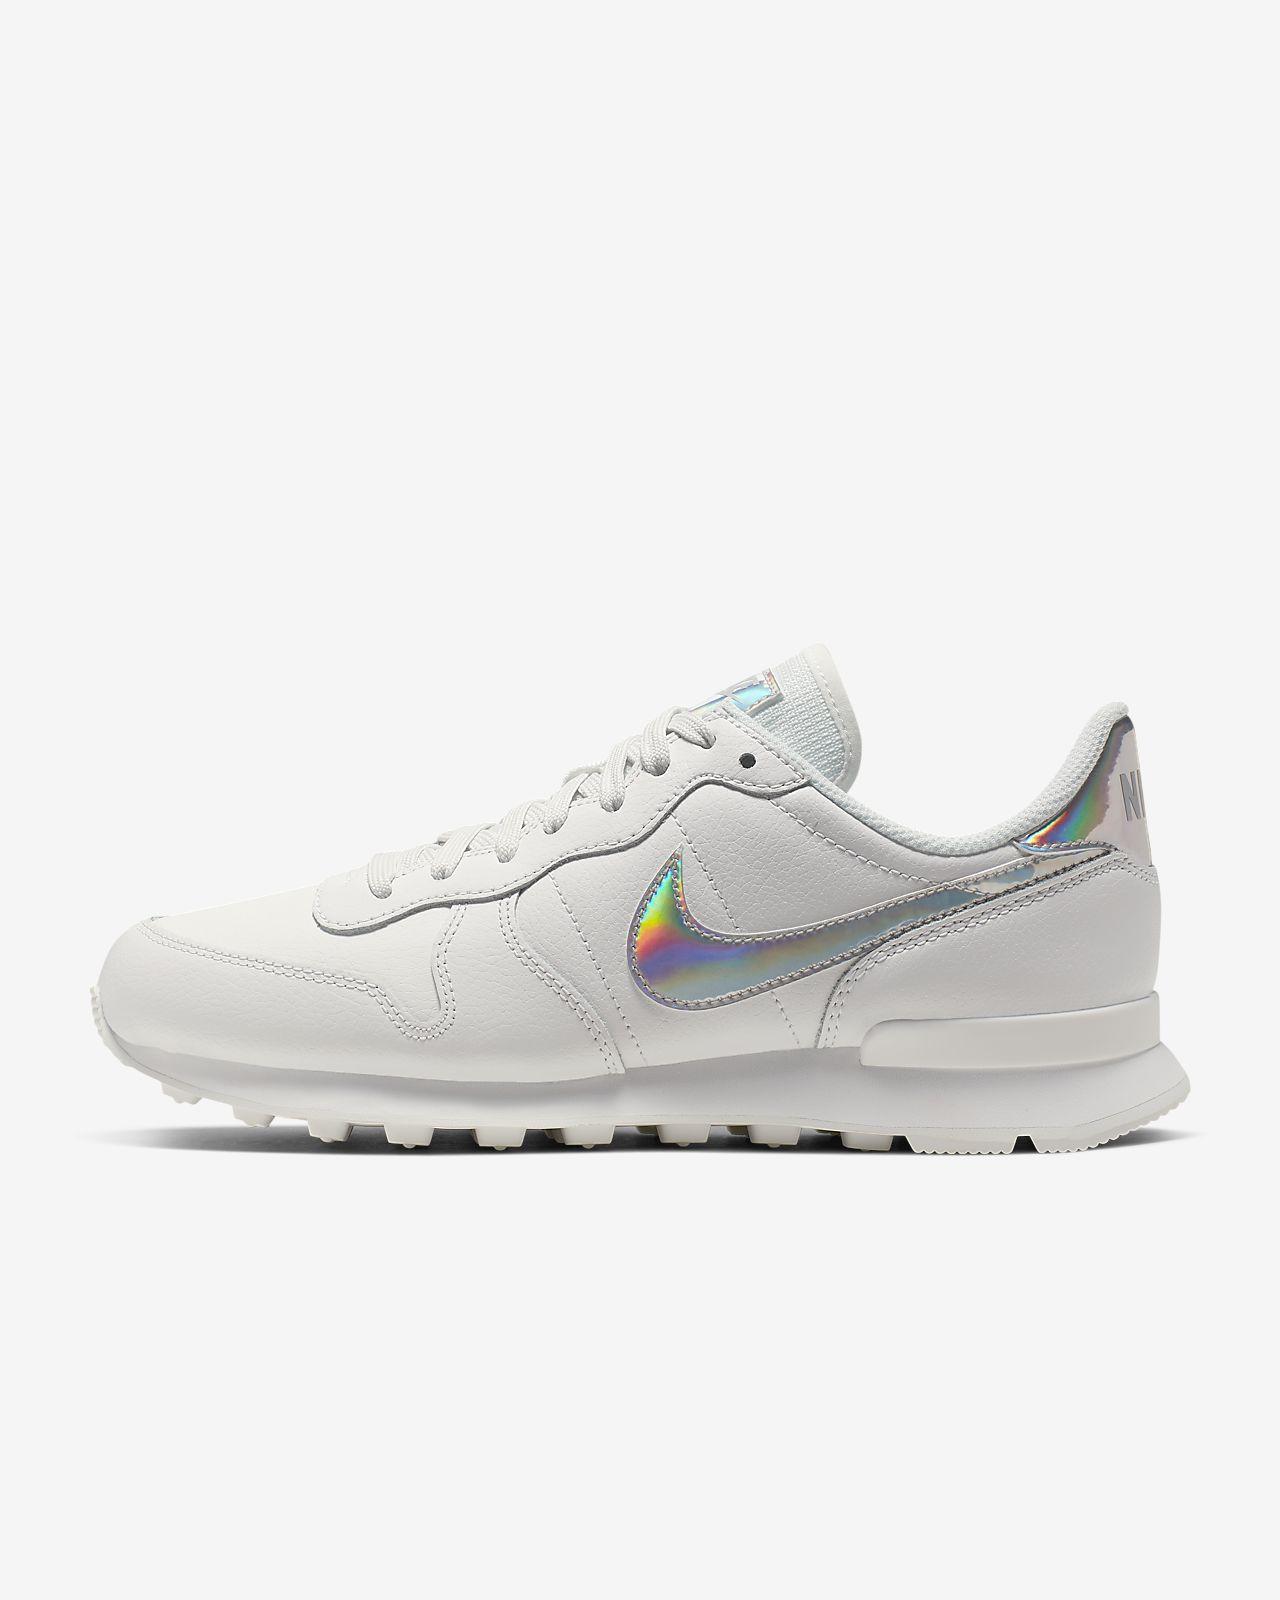 Chaussures Nike de Femme Internationalist brun | nike